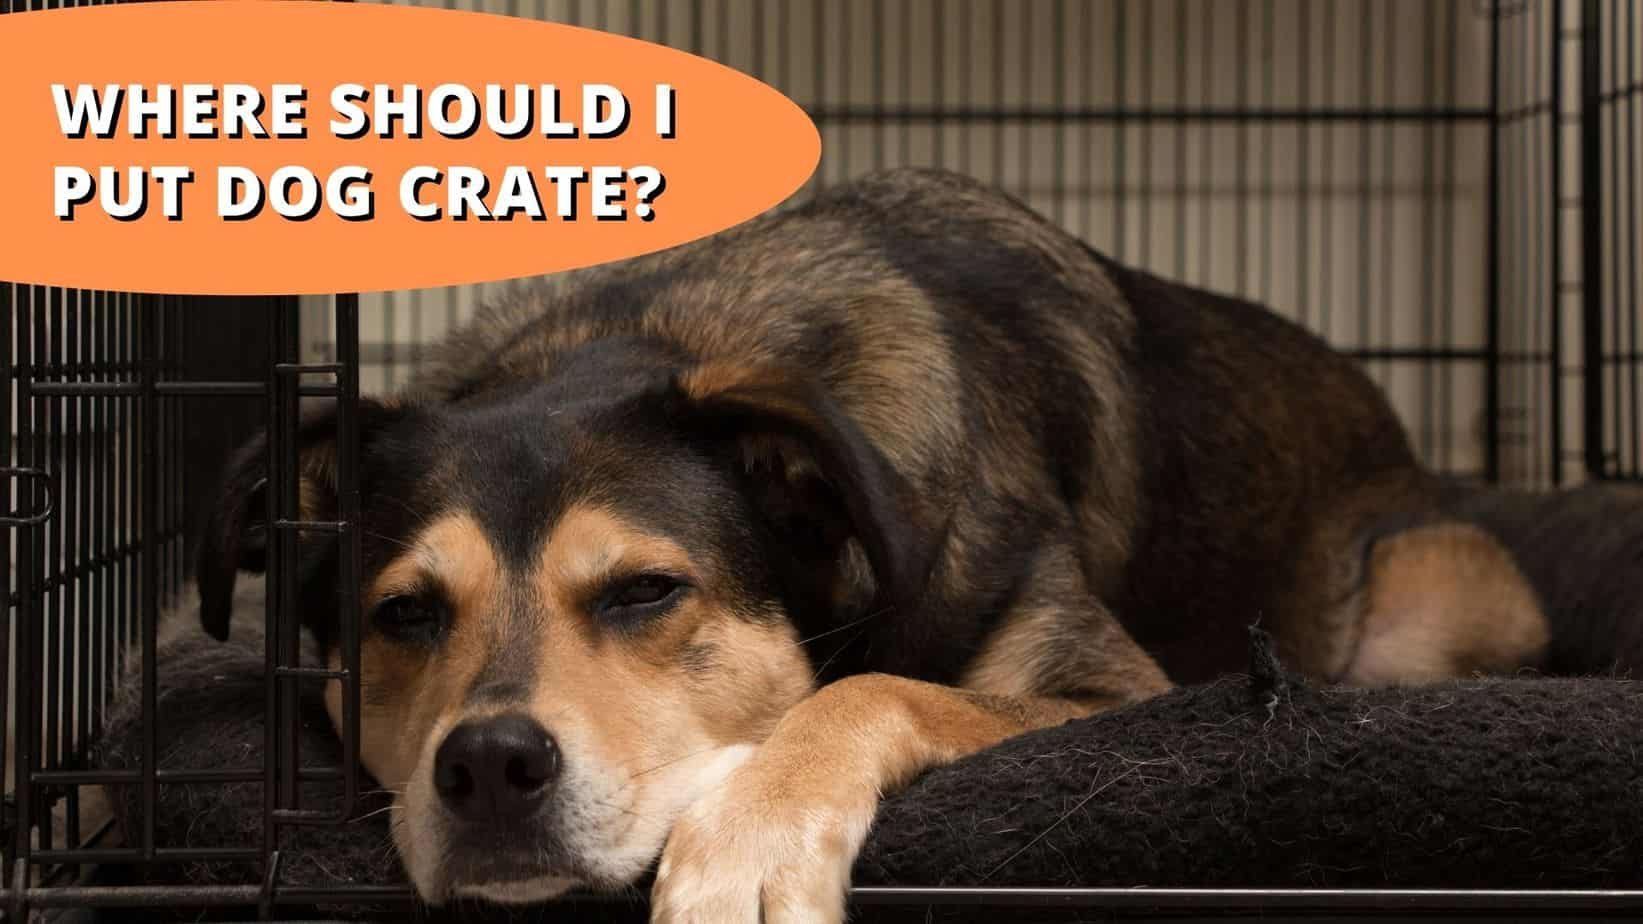 where should i put dog crate